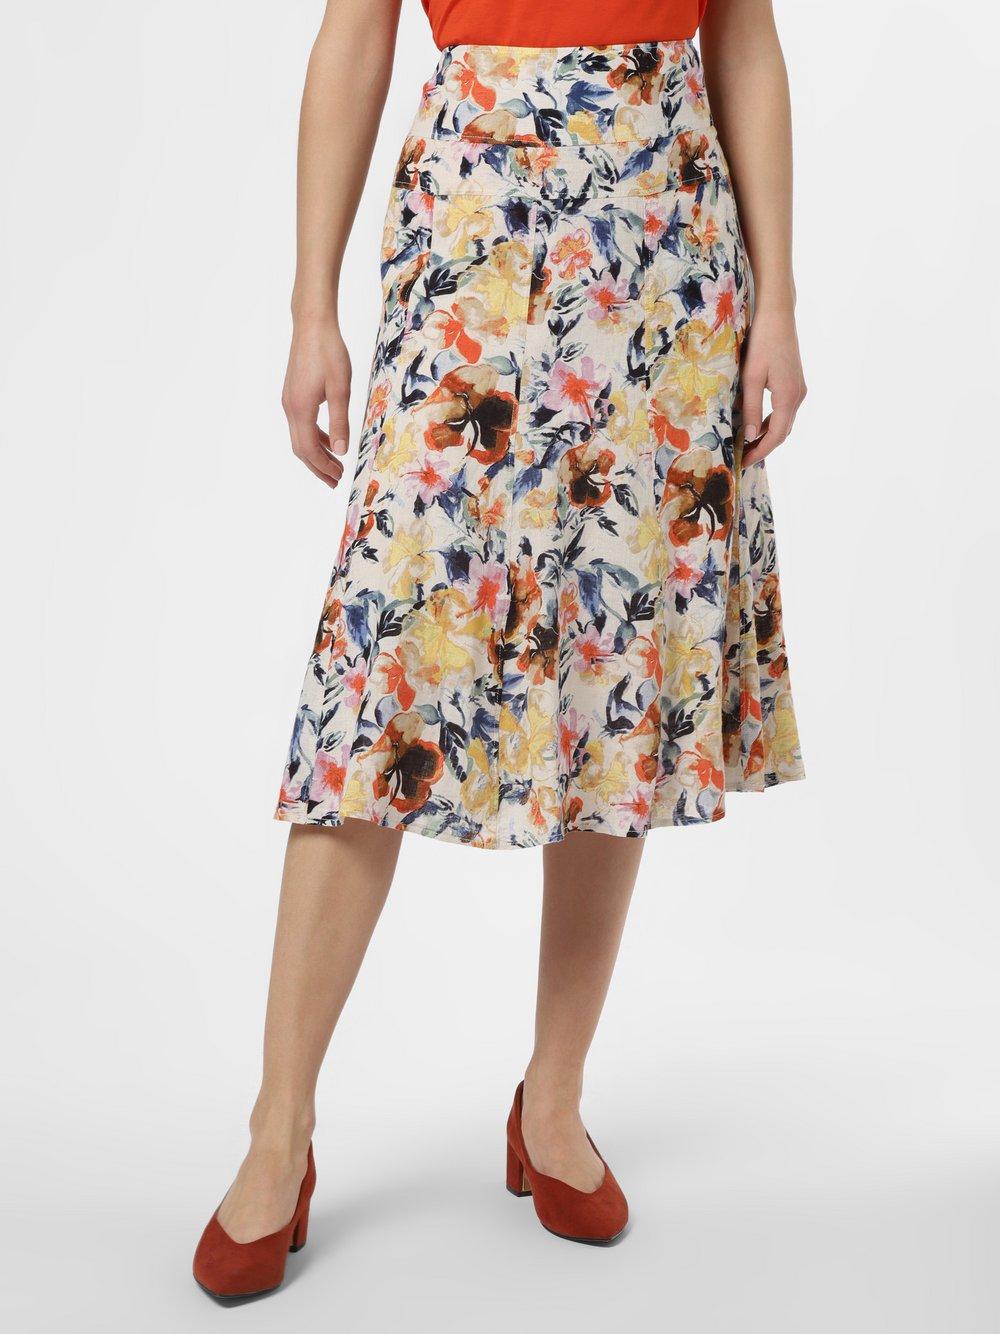 Franco Callegari - Damska spódnica lniana, pomarańczowy